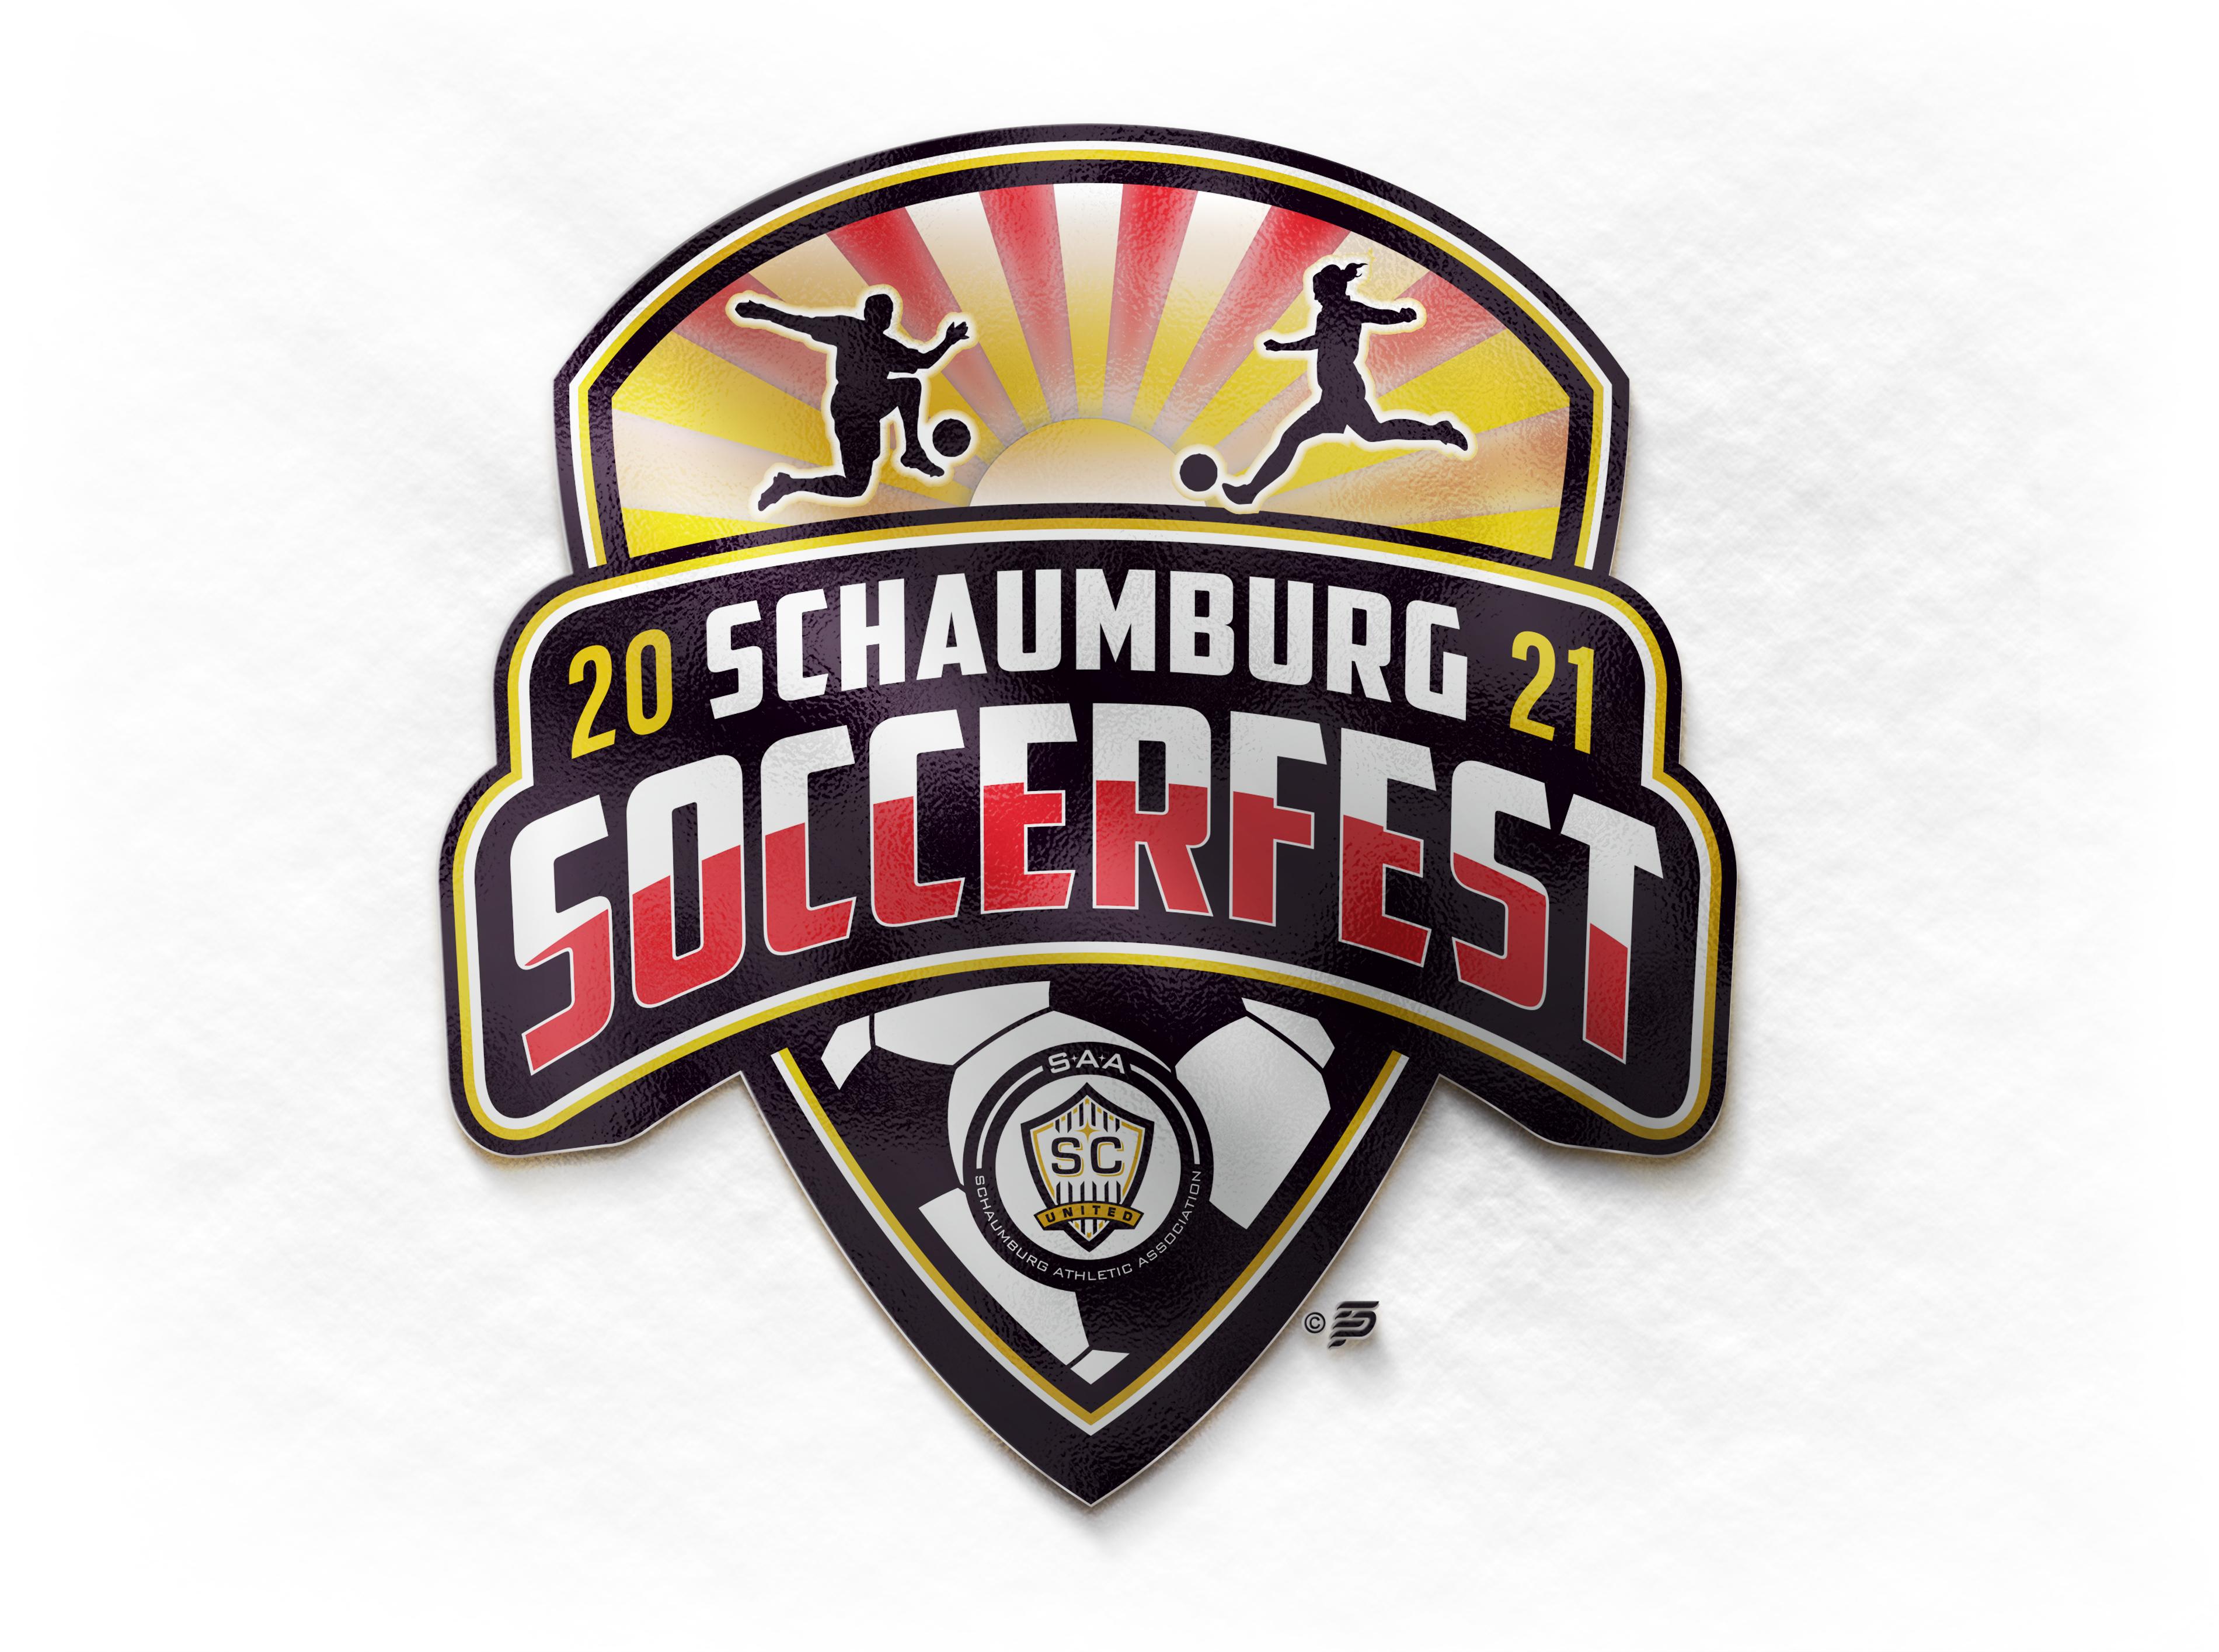 2021 Schaumburg Soccerfest